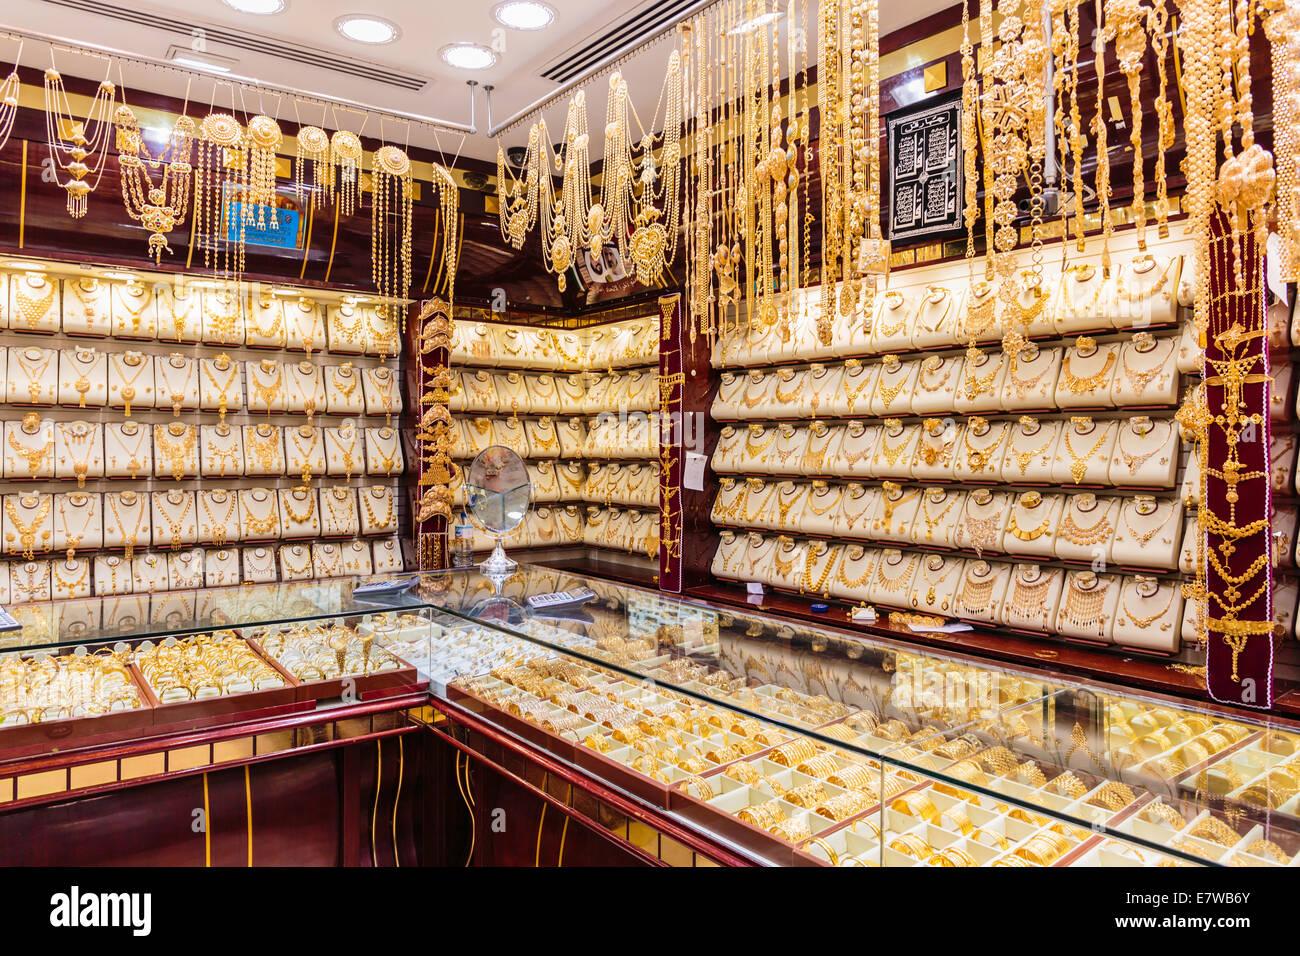 Gold market in Dubai, Deira Gold Souq - Stock Image